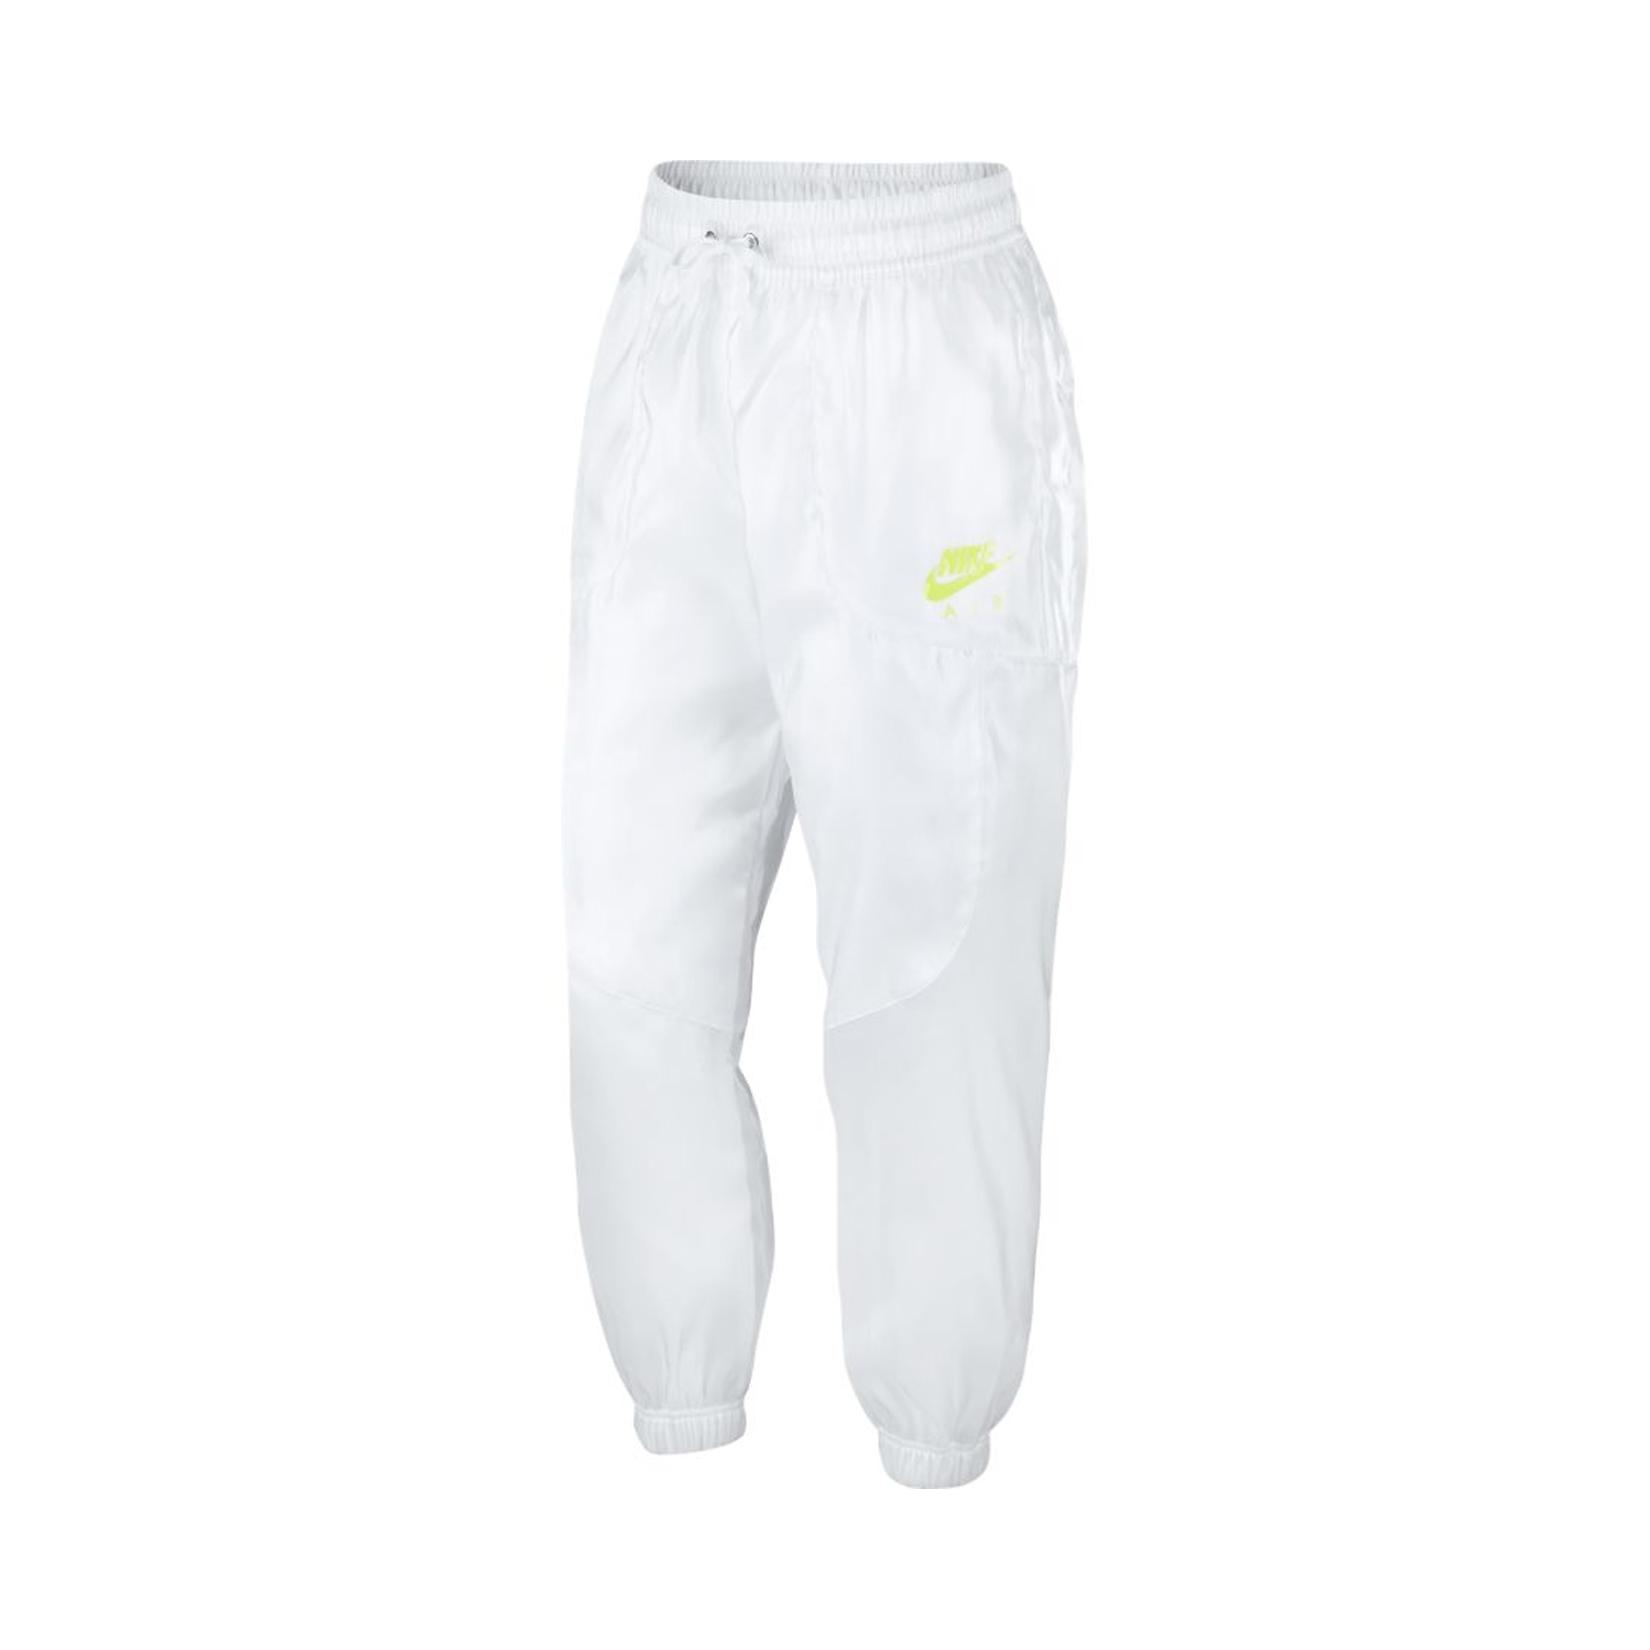 Nike Sportswear Air Pants White